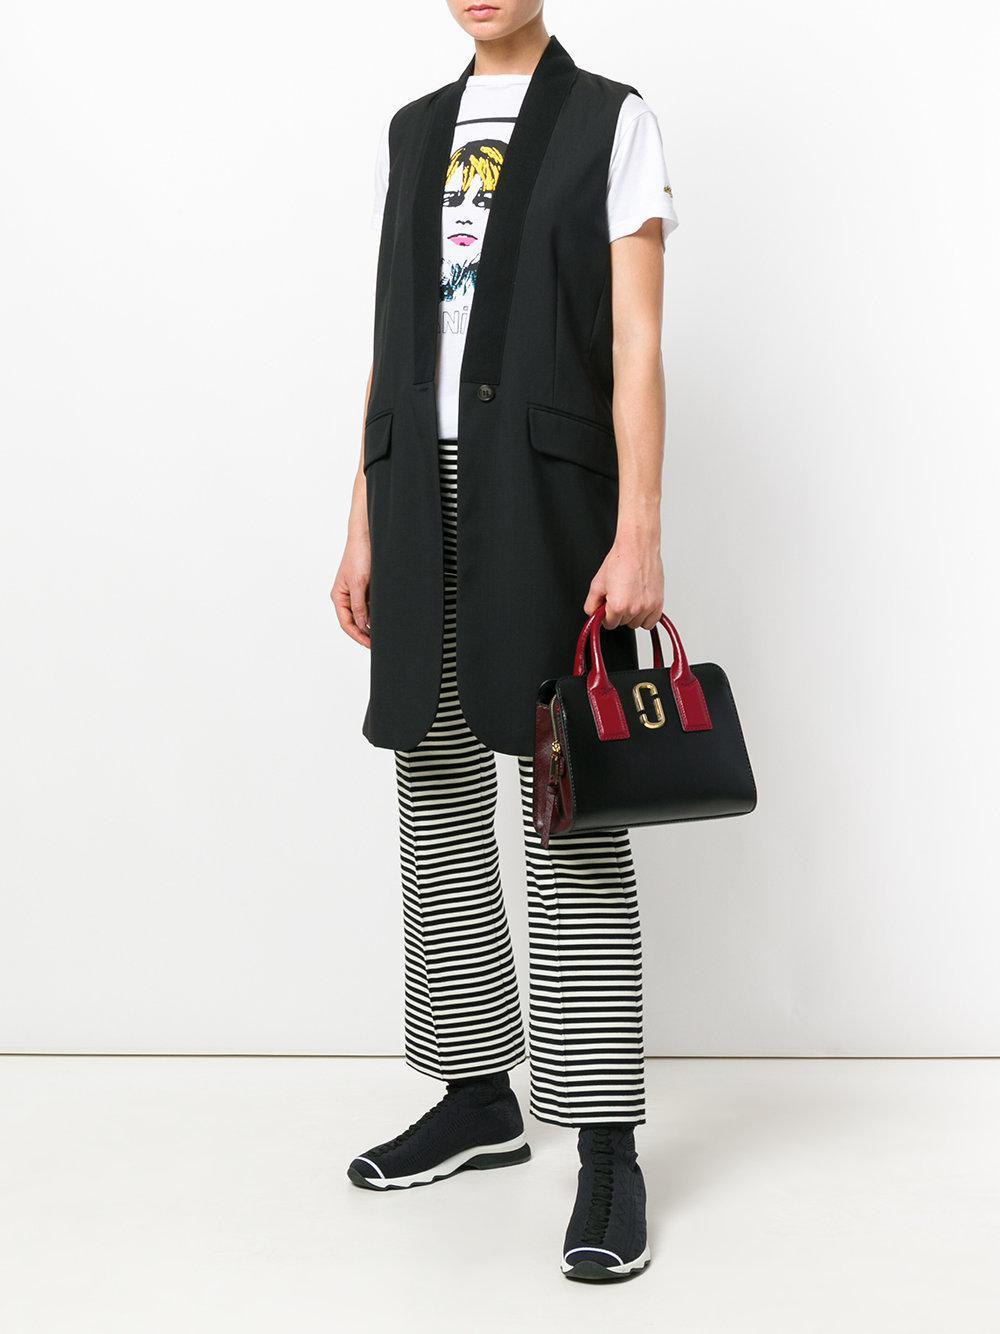 Lyst - Marc Jacobs Little Big Shot Leather Bag in Black c297da5a1d53b